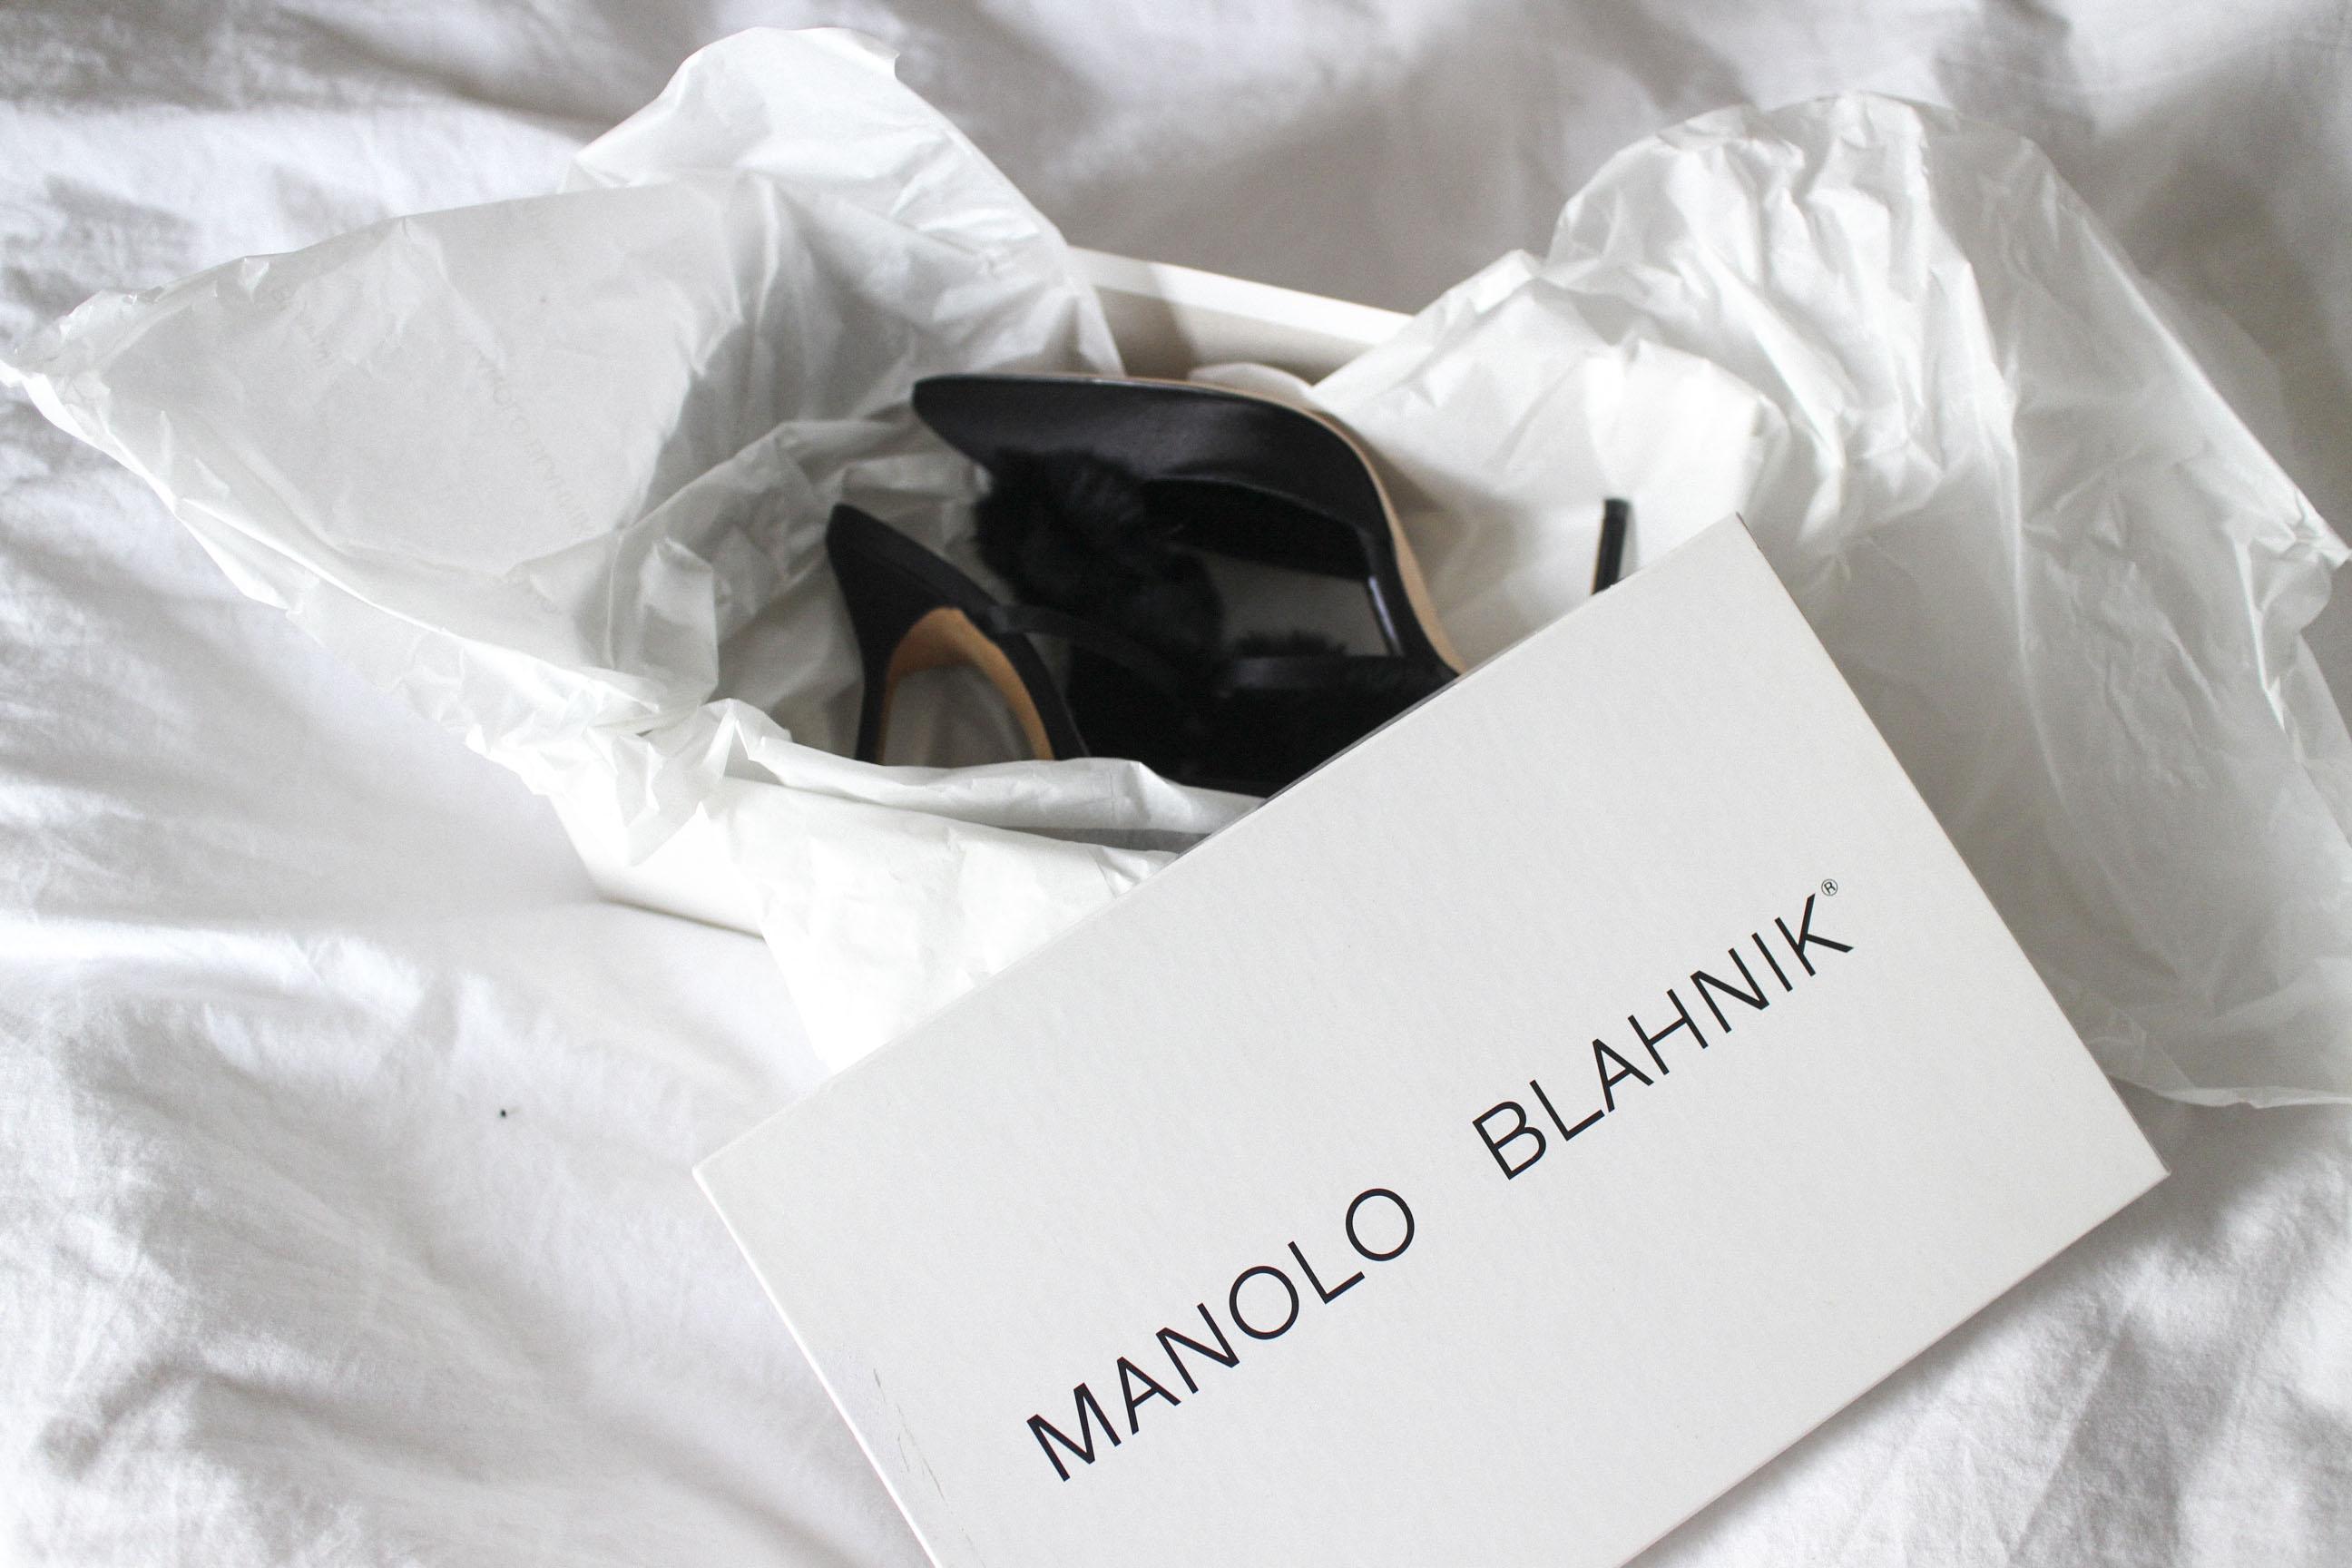 Iheartalice Manoloblahnik